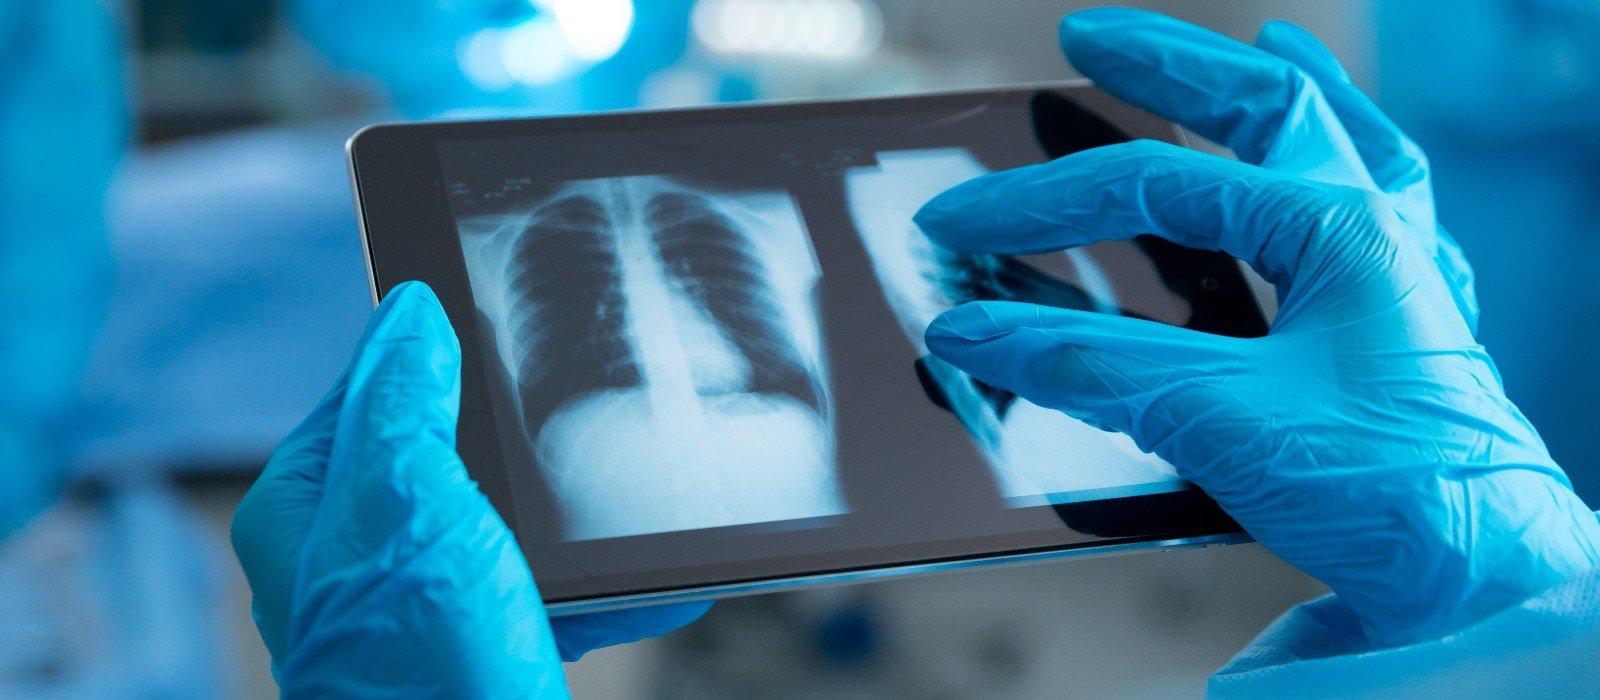 AI lung disease detection